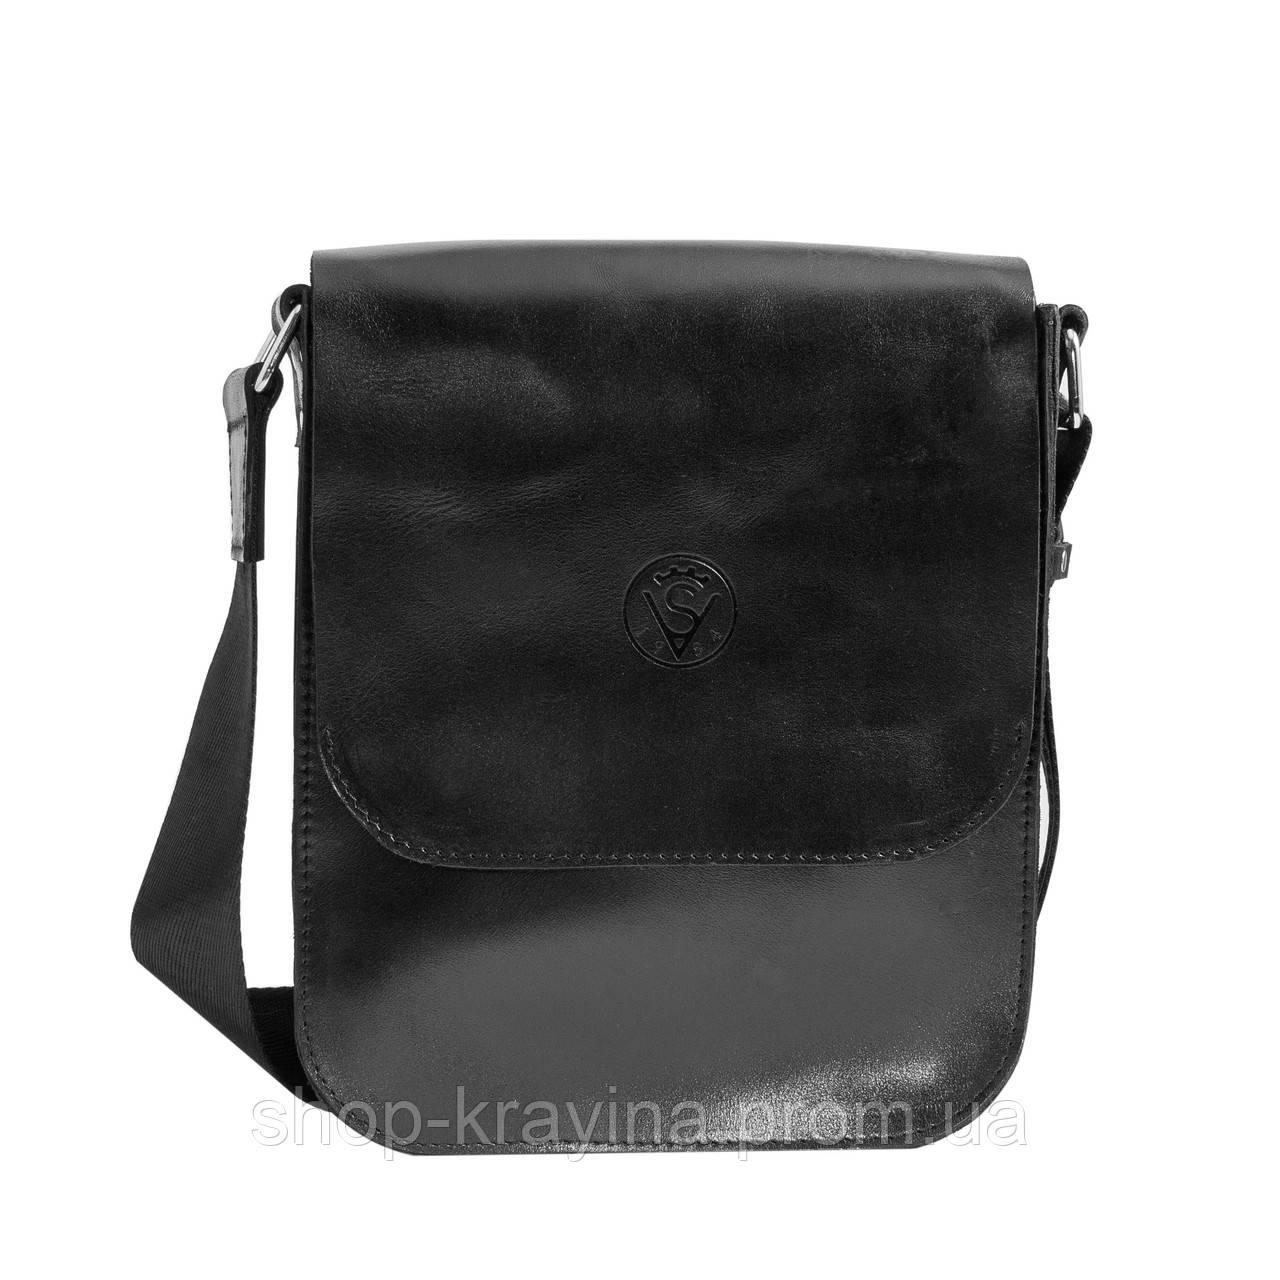 9c10bae07e07 Кожаная мужская сумка VS214 black gloss 20х23х5.5 см - Интернет магазин  сумок, обуви